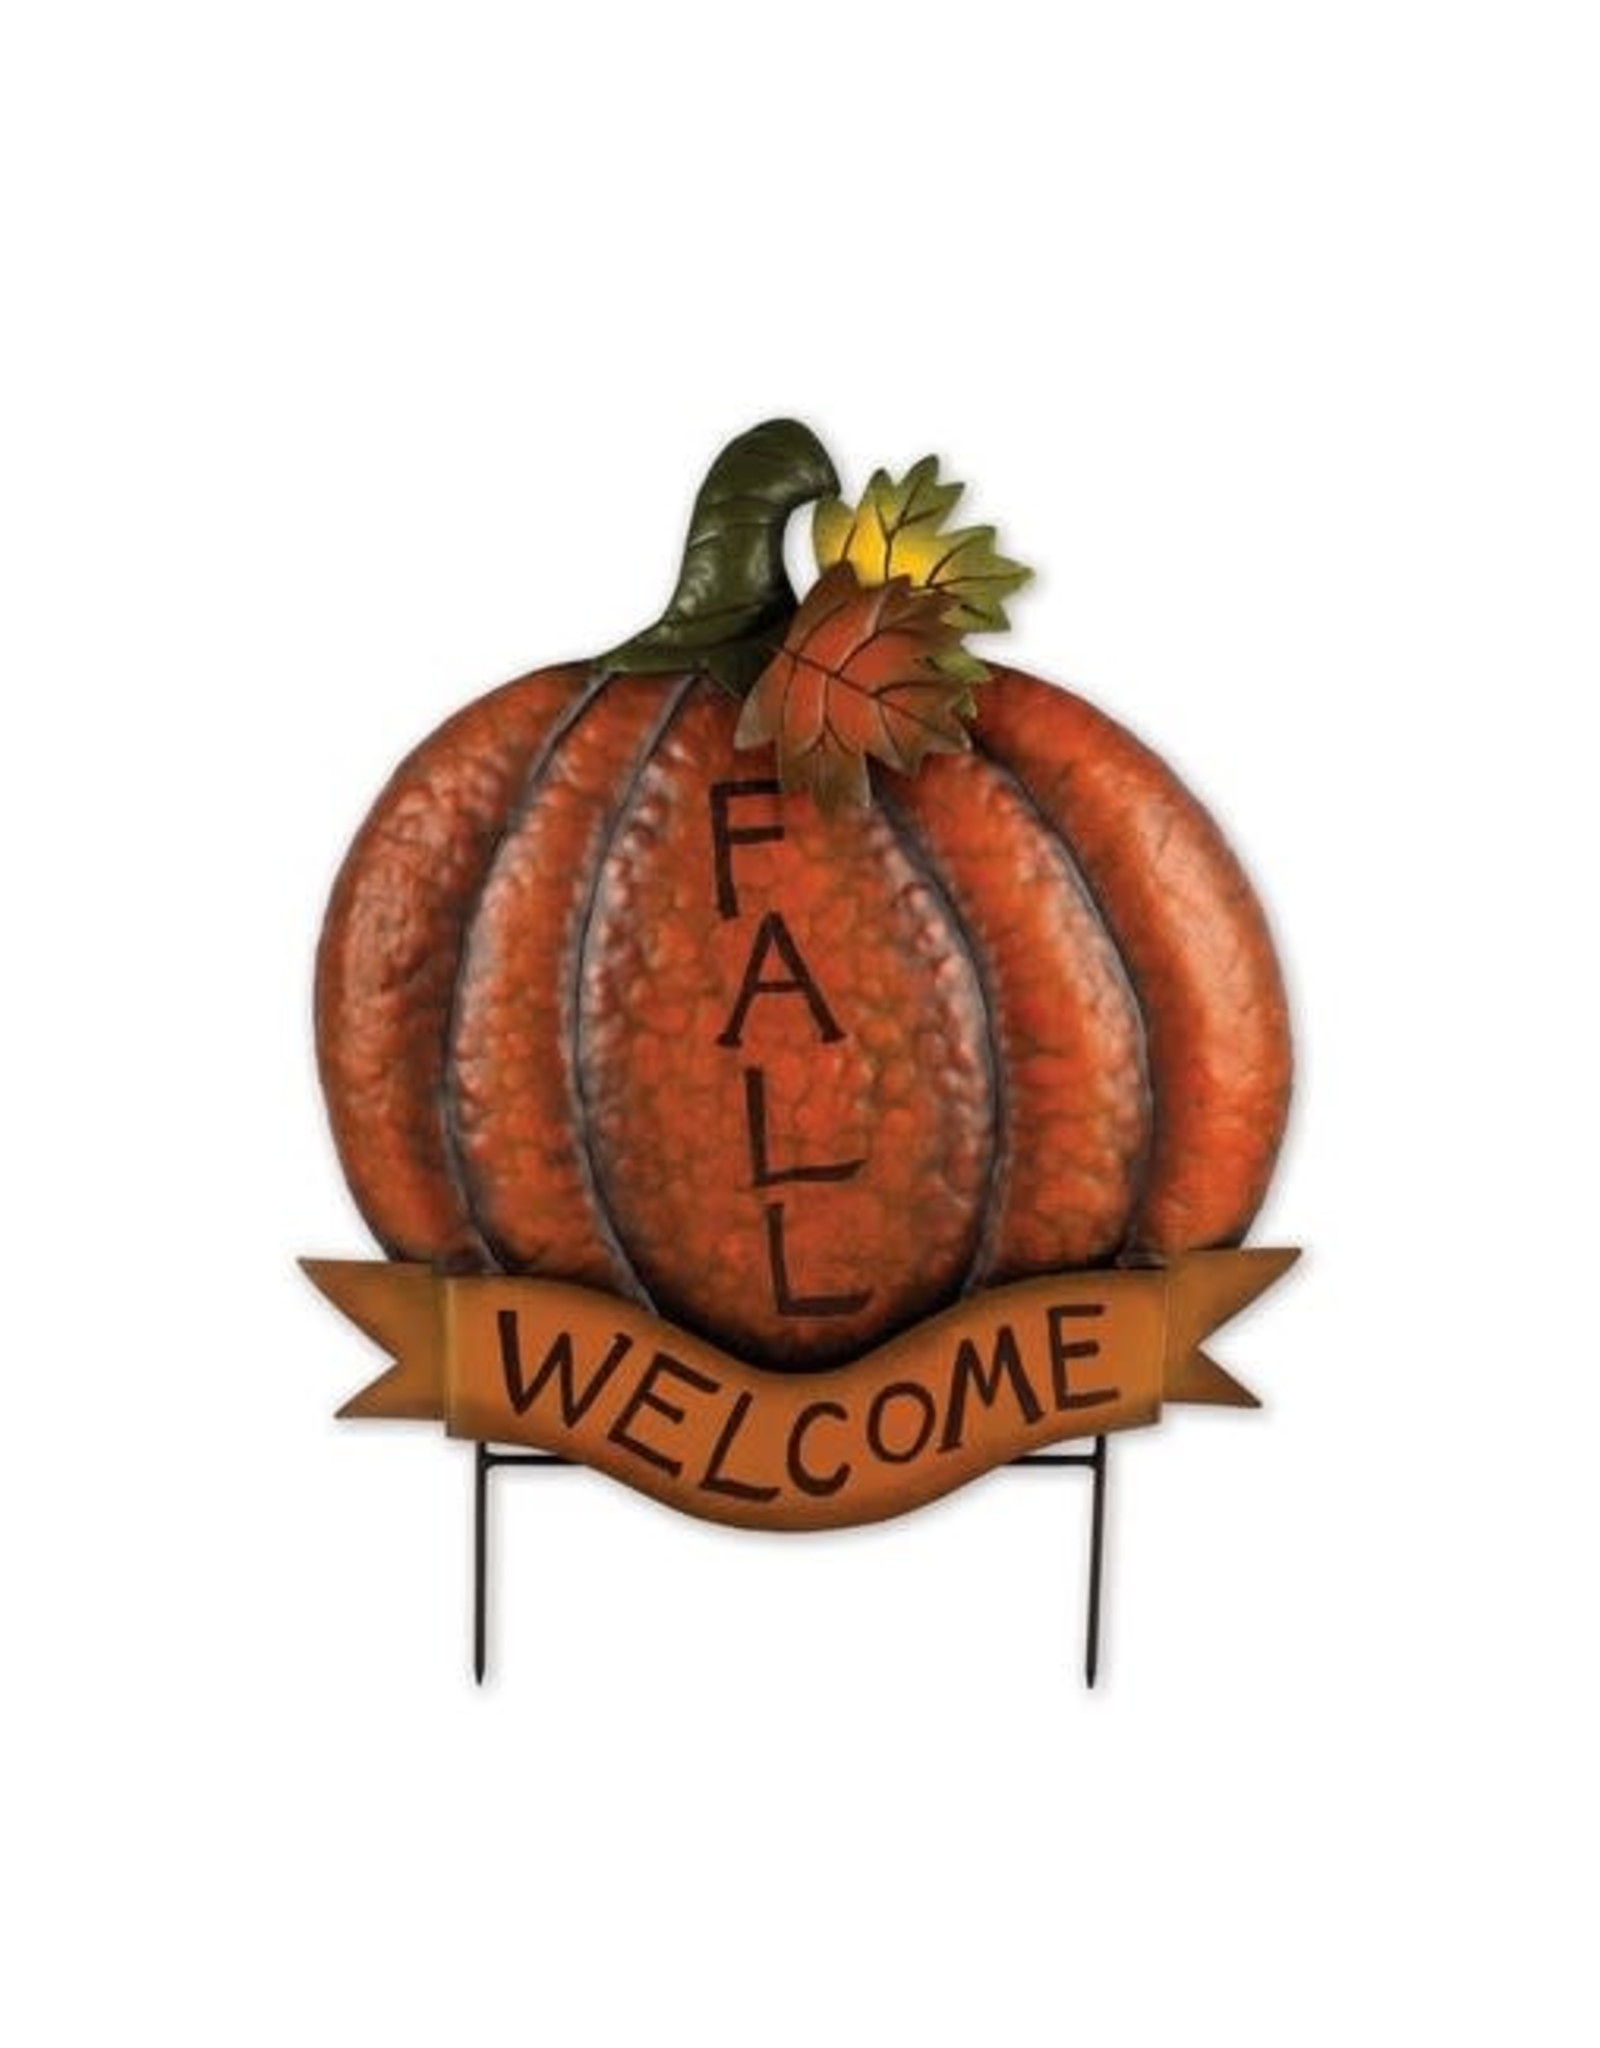 Harvest Stake - Pumpkin Welcome